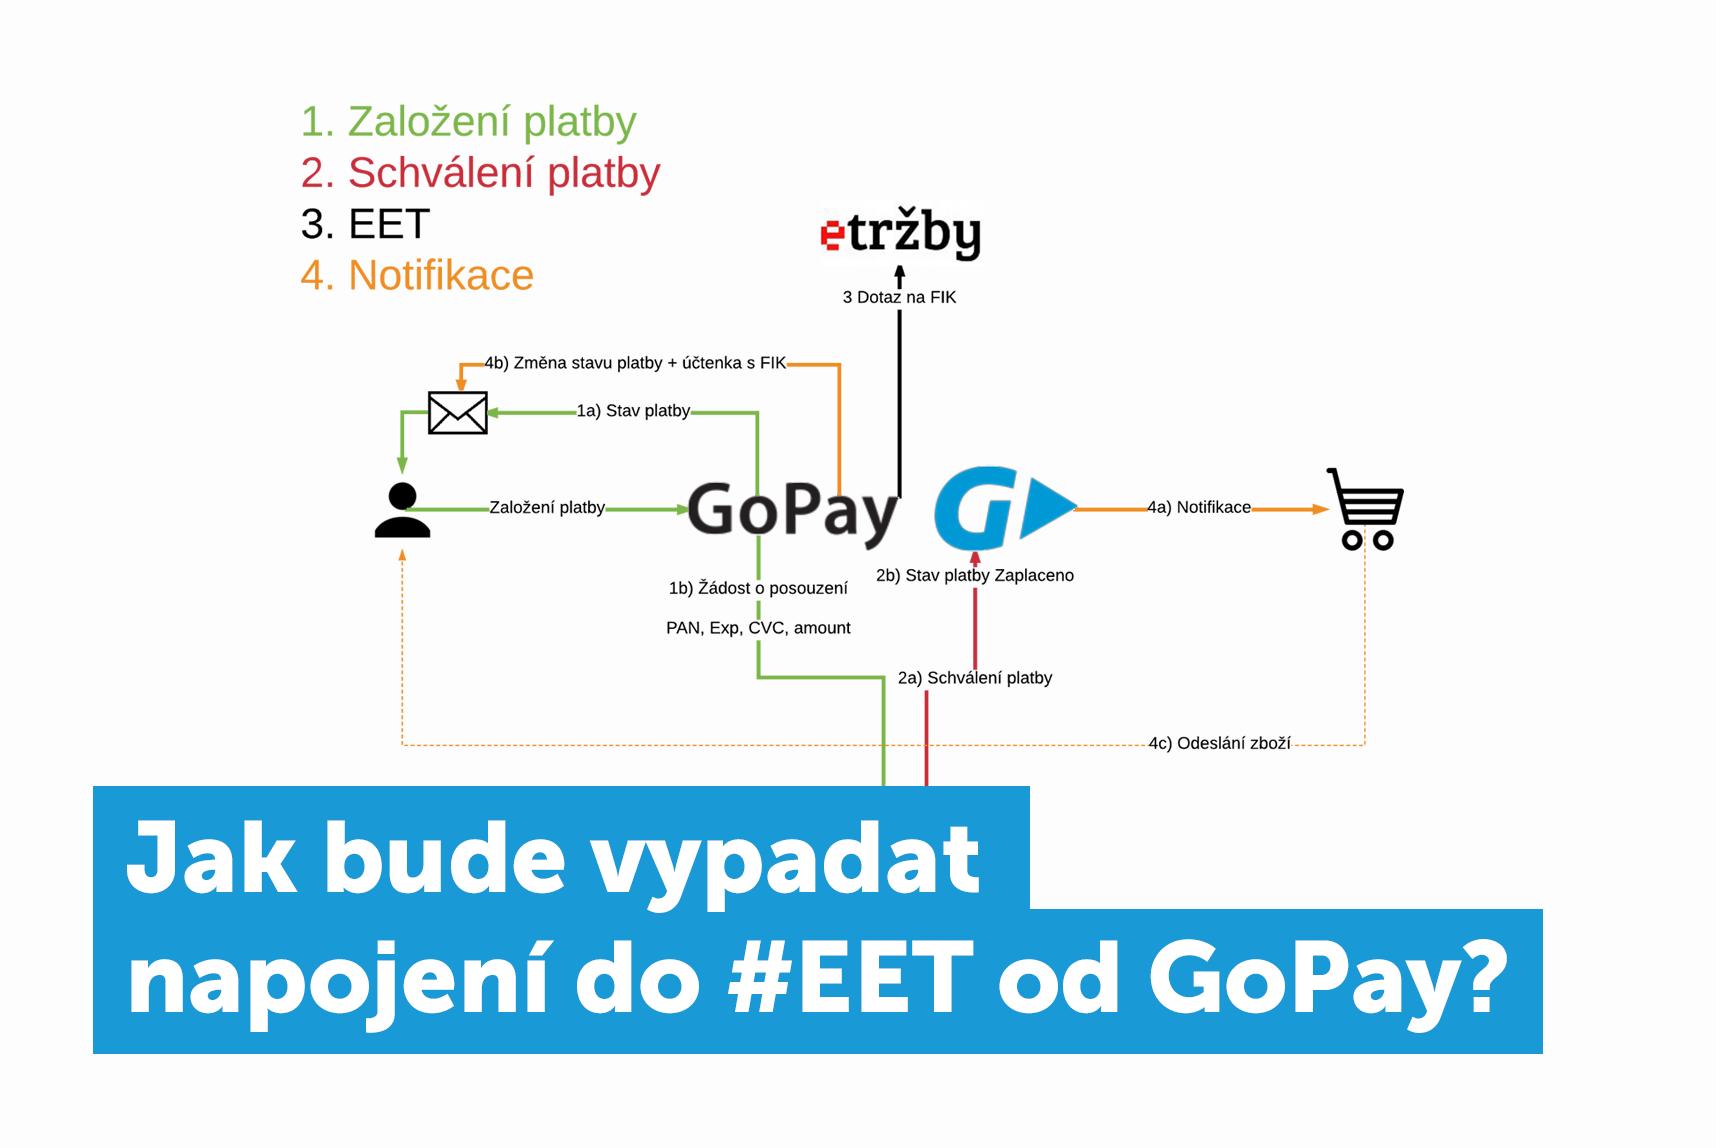 GoPay EET